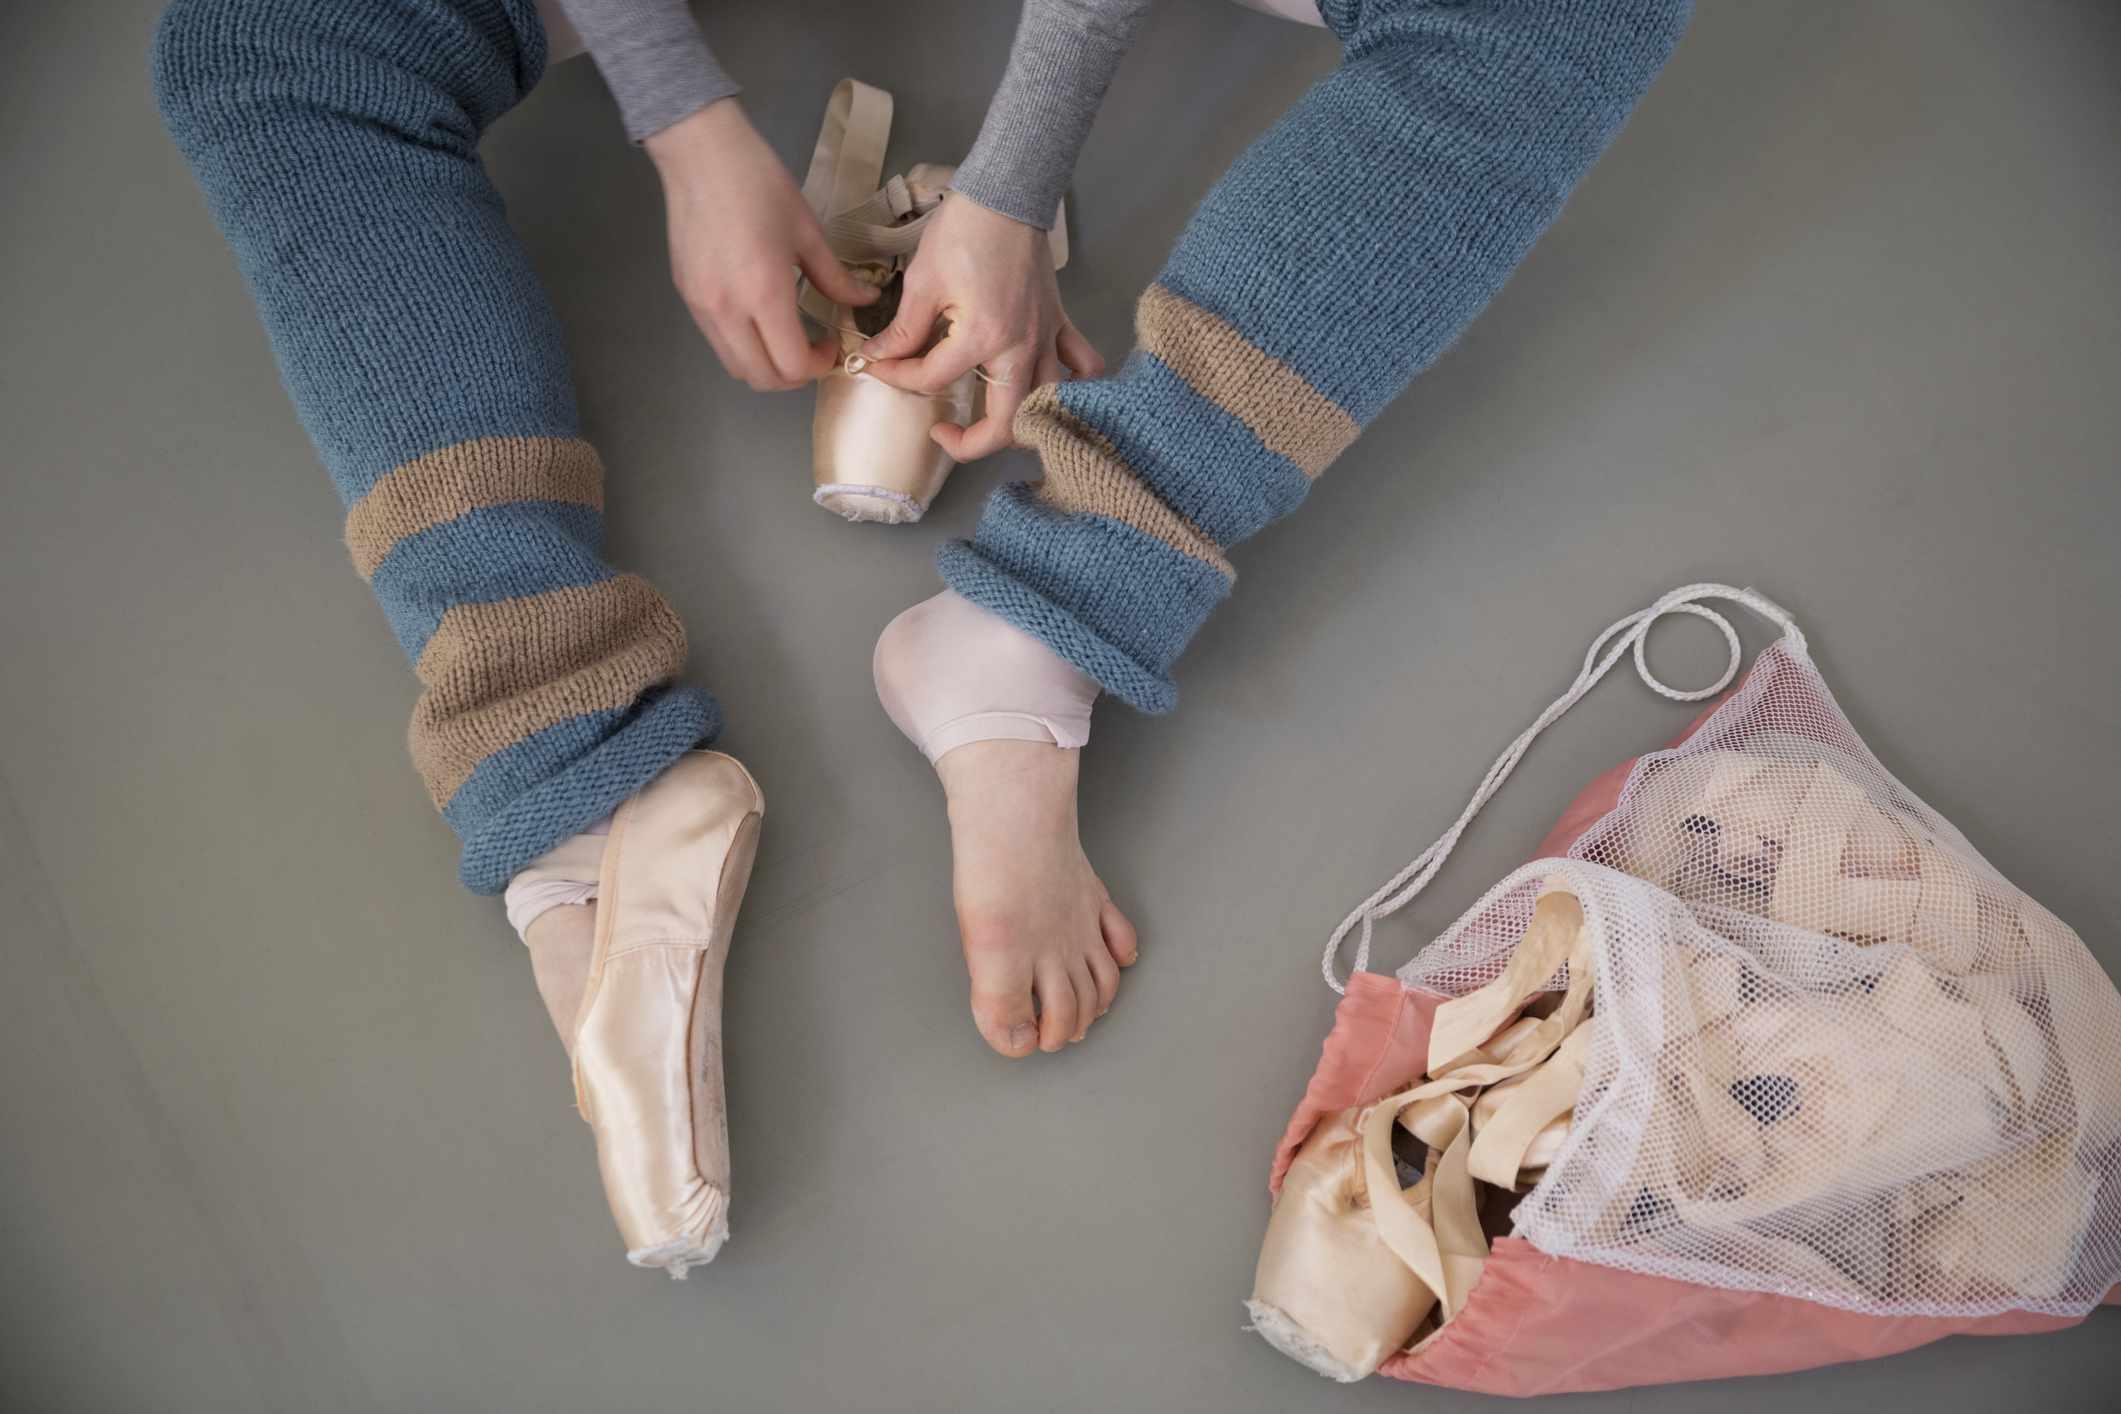 female ballet dancer in leg warmers putting on ballet shoes